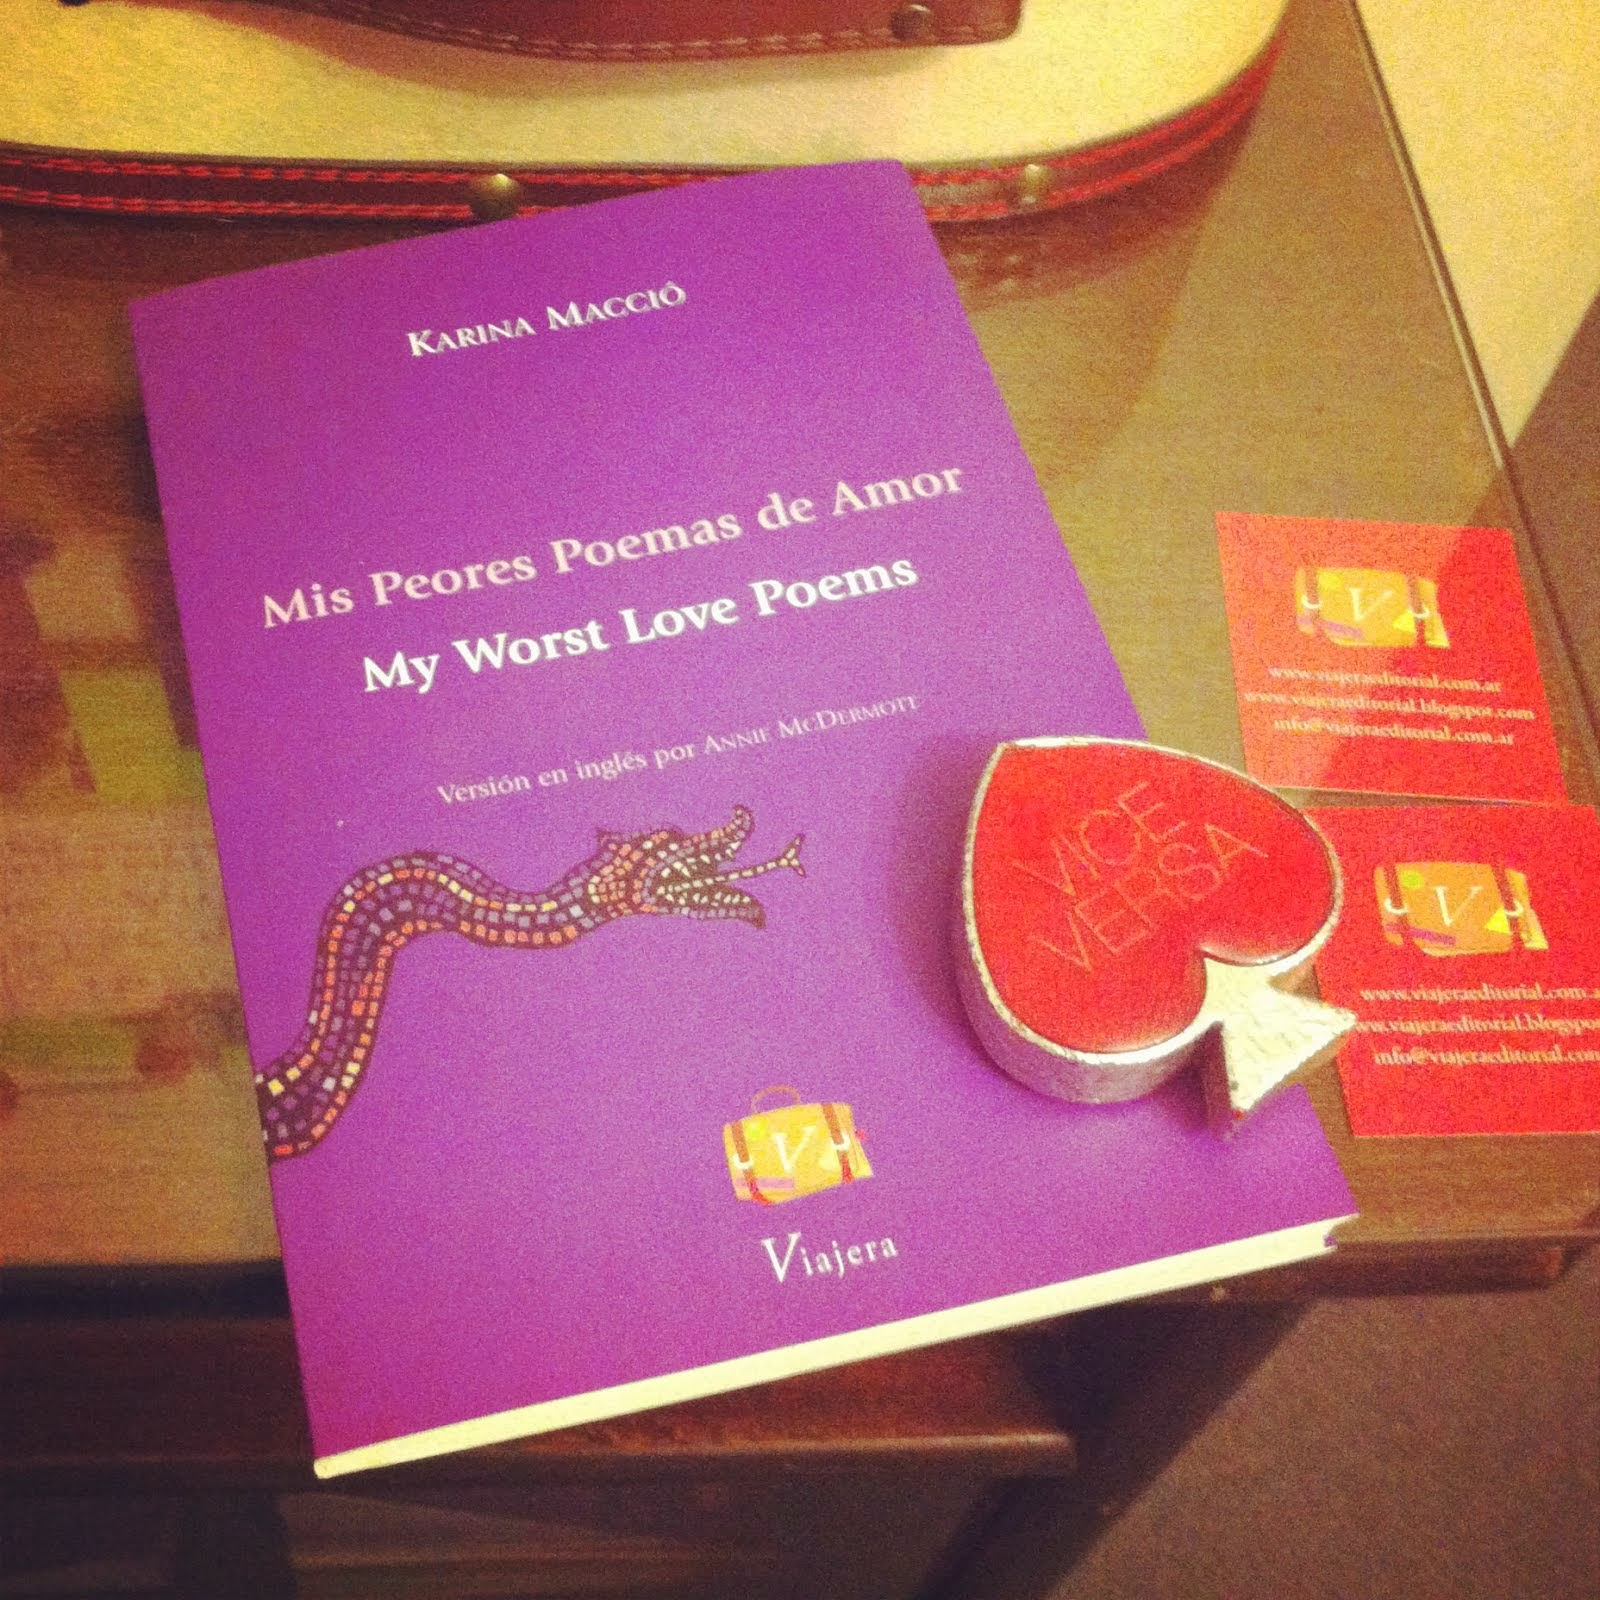 Mis Peores Poemas de Amor / My Love Worst Poems